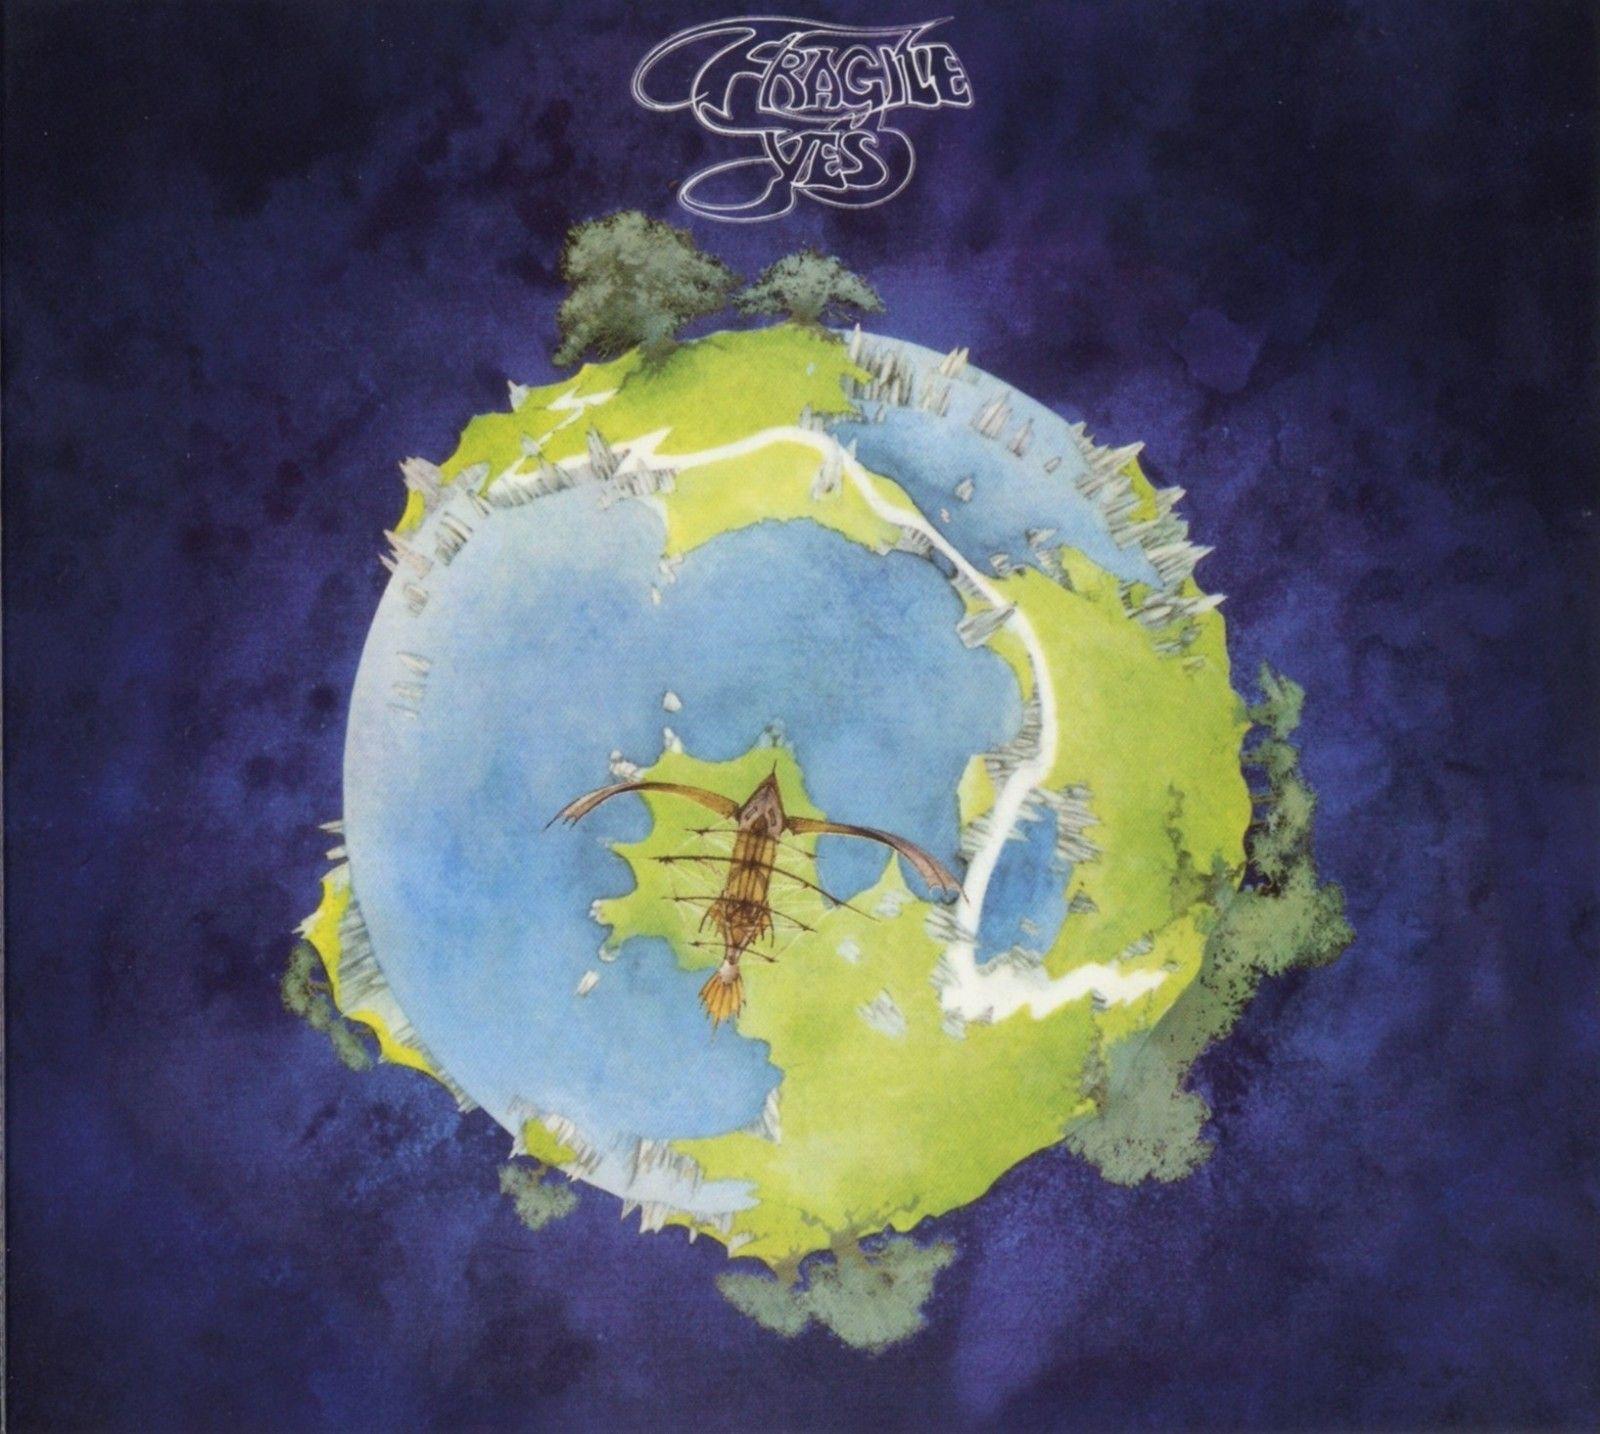 Fragile (Yes album)